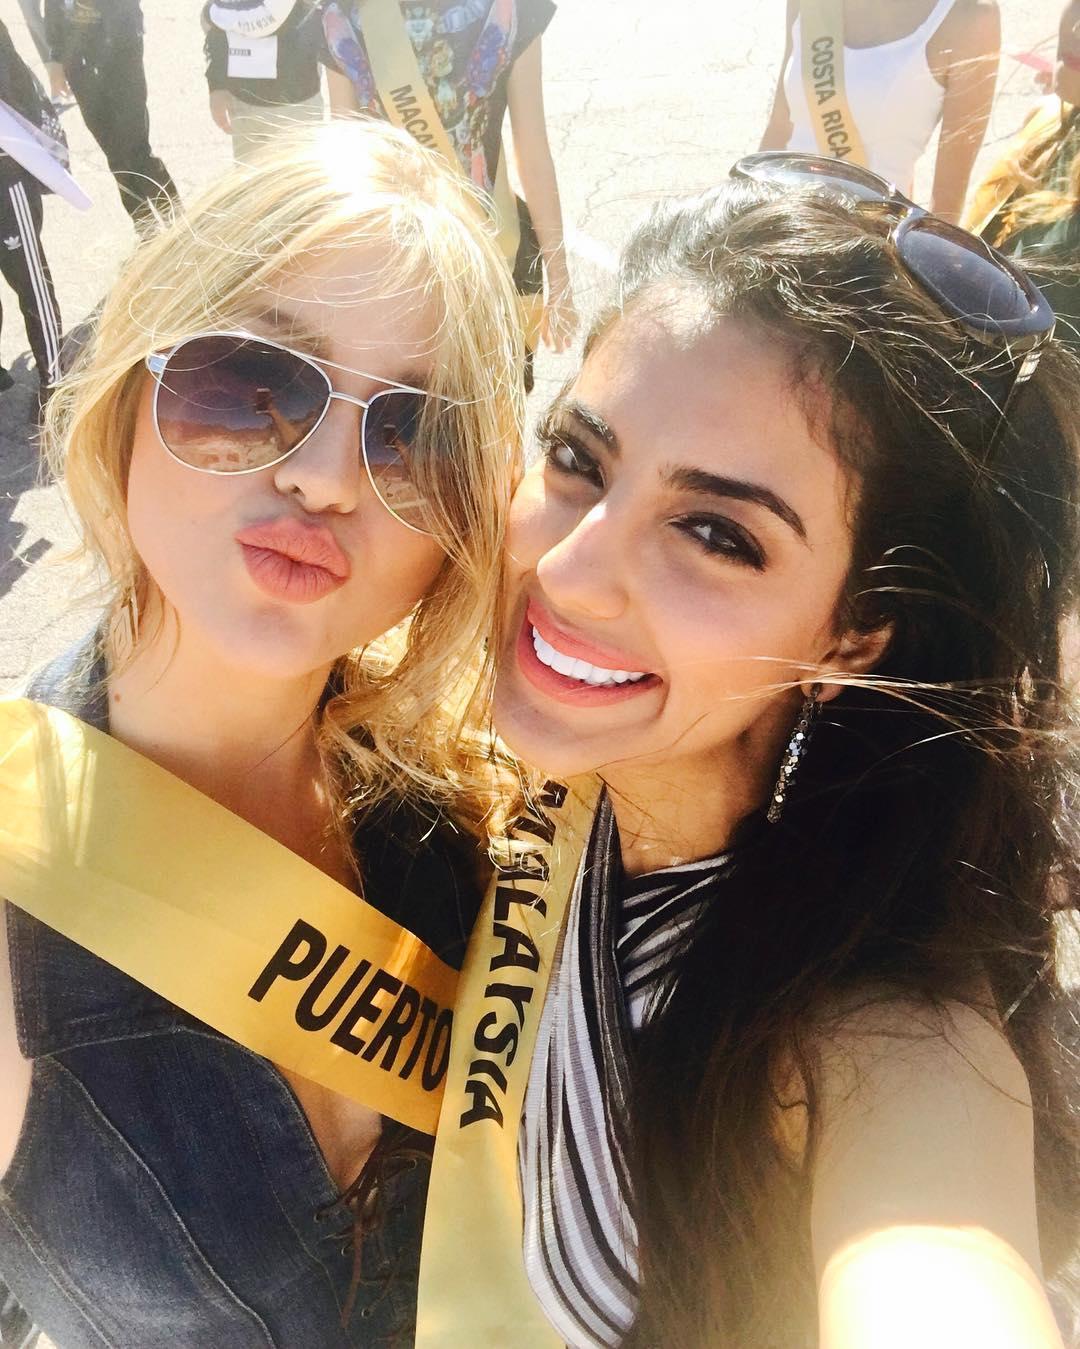 madison anderson, top 4 de miss grand international 2016. - Página 4 Oozfgtmj